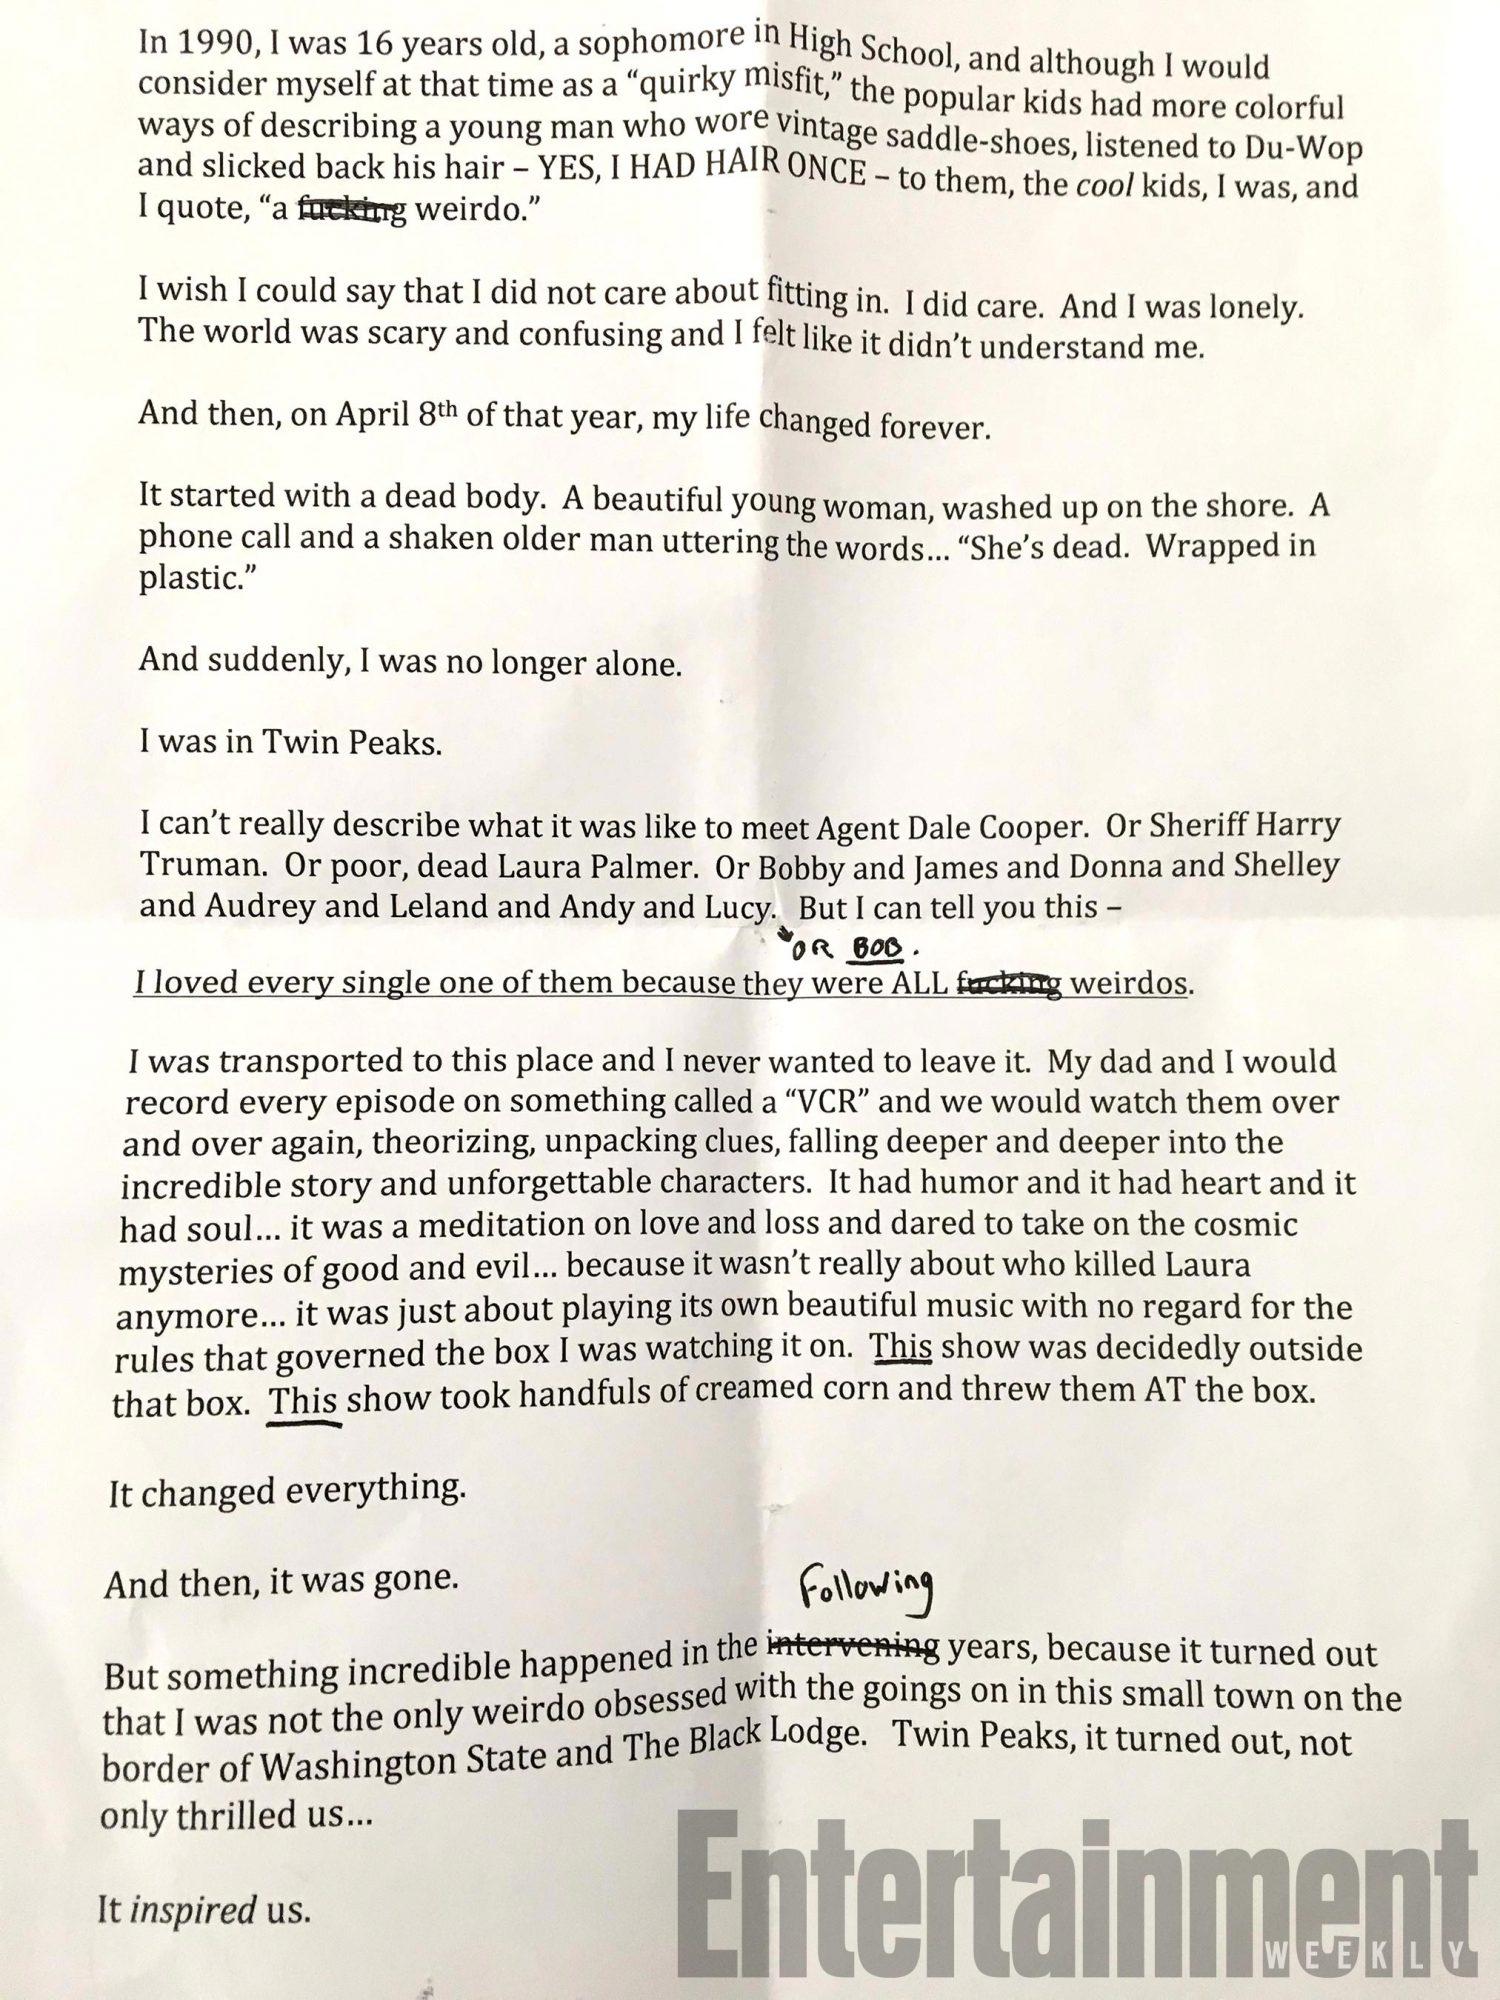 Twin Peaks transcripts CR: Damon Lindelof